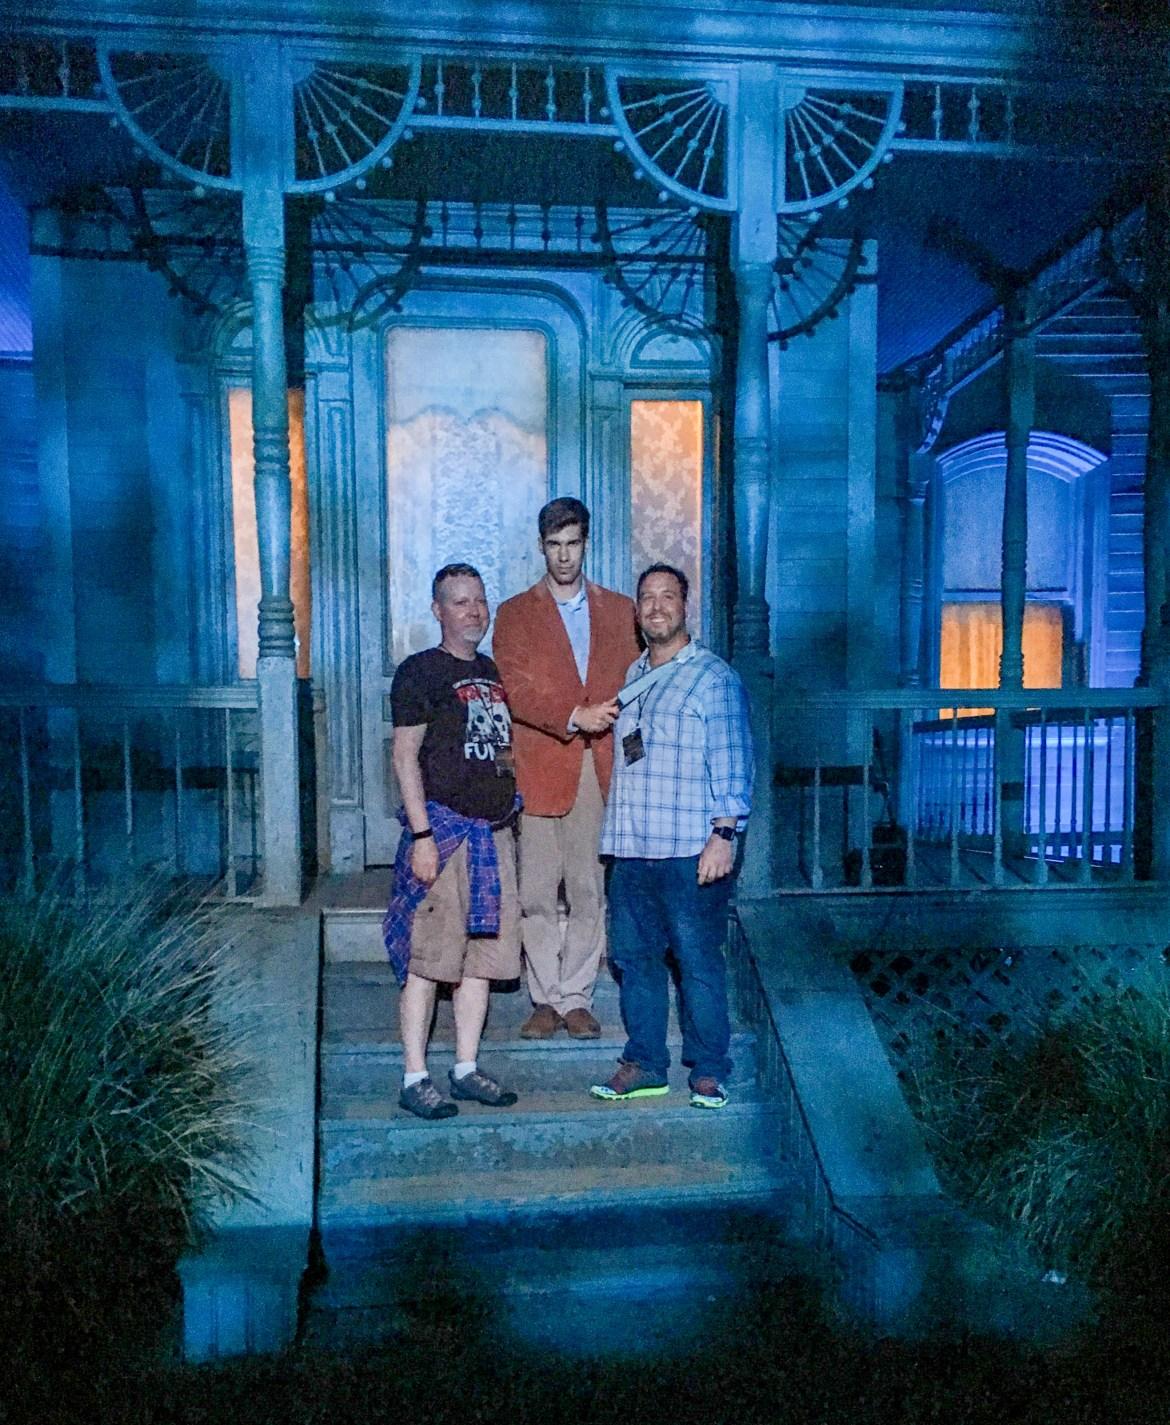 Universal Halloween Horror Nights Los Angeles California #halloweenhorrornights